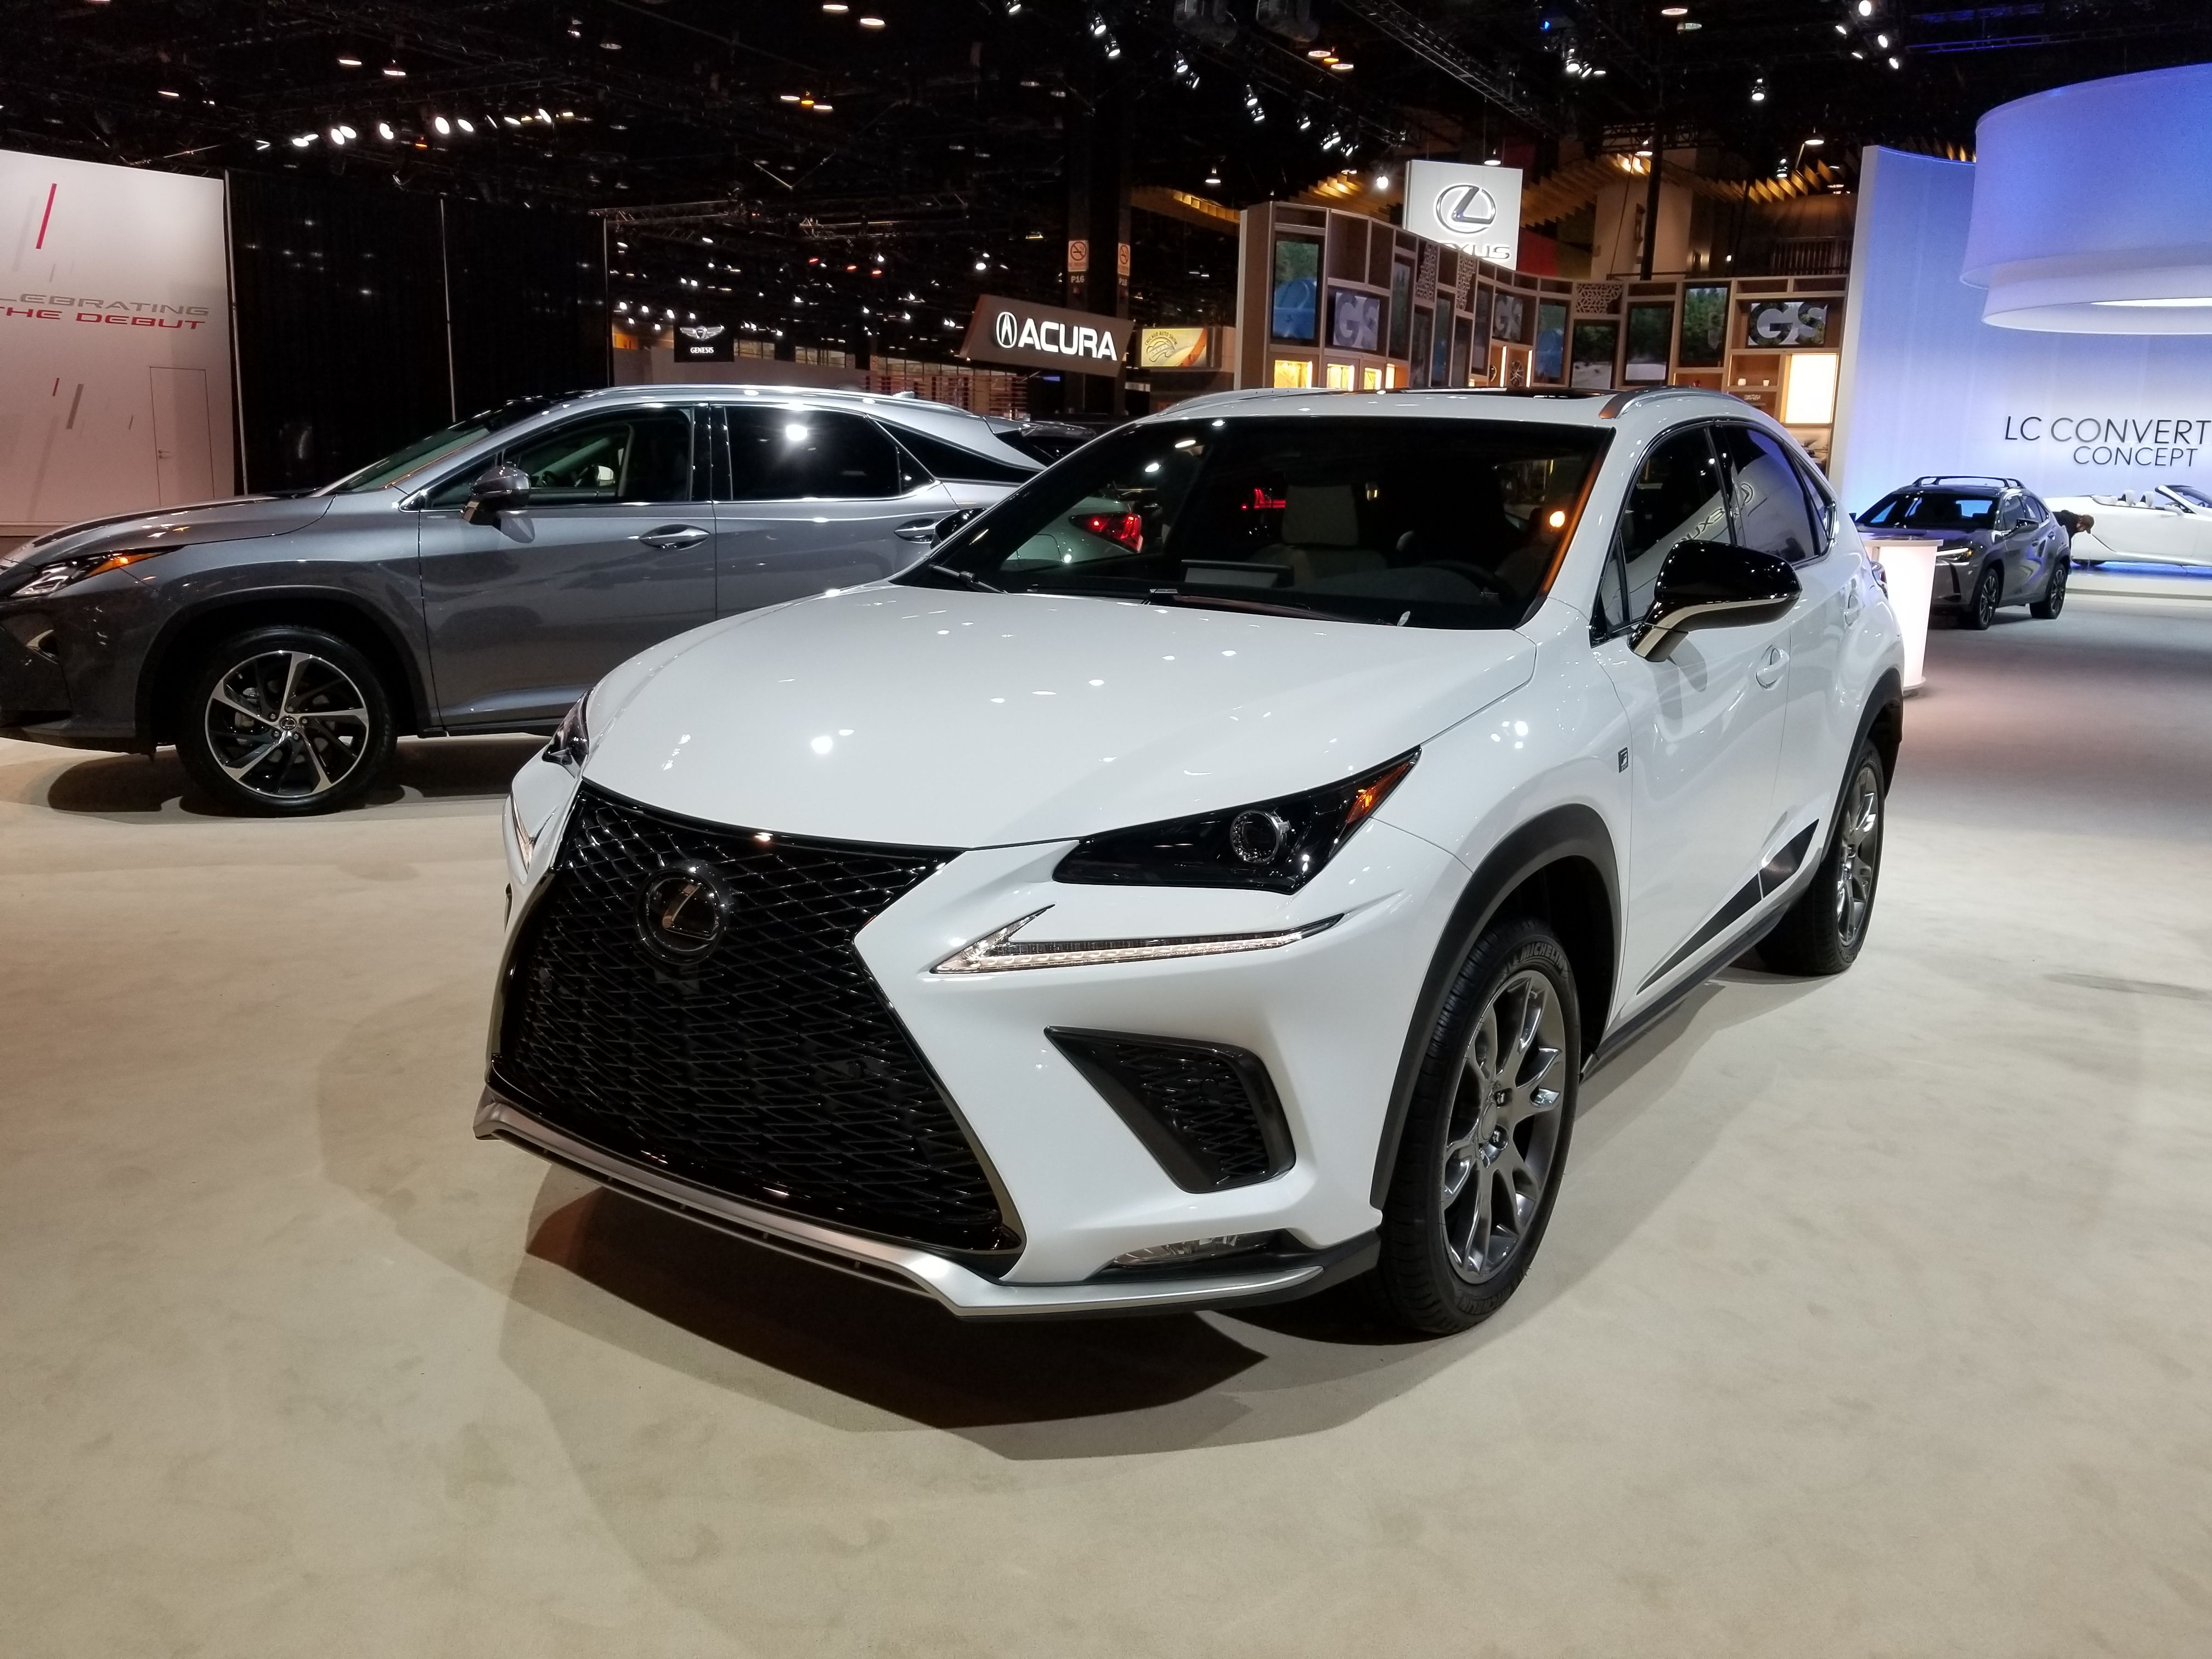 2019 Lexus Nx F Sport Black Line Edition Top Speed Lexus Lexus Nx 200t Luxury Crossovers